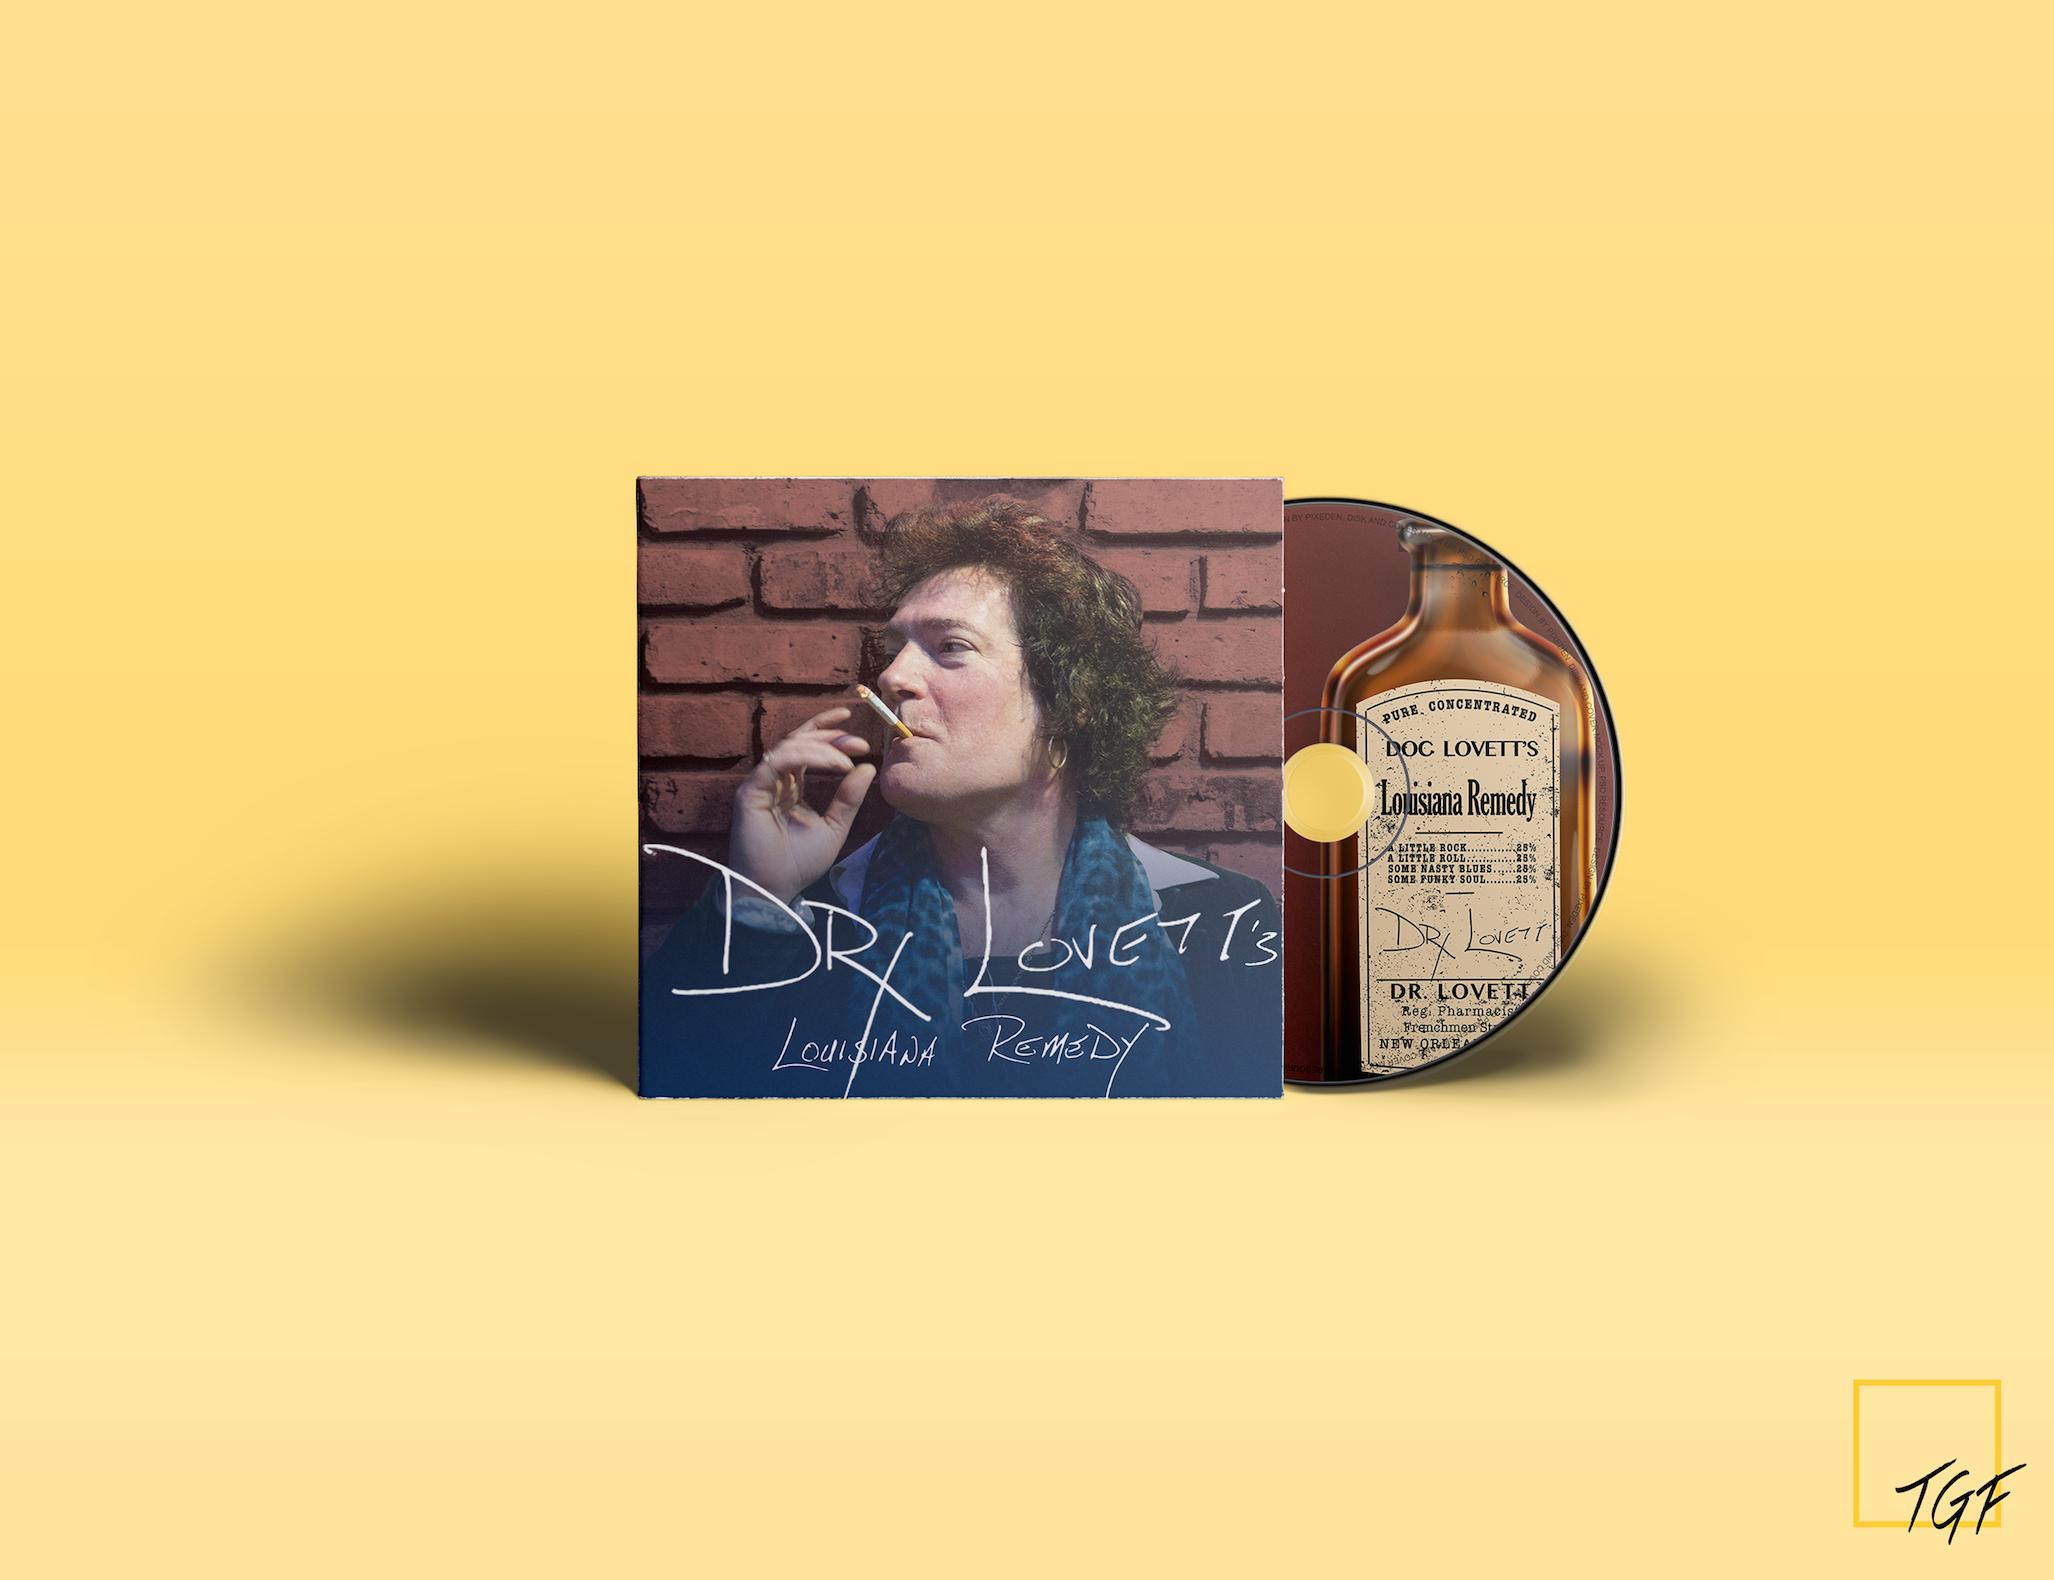 Doc-Lovett's-Louisiana-Remedy-Album-Artwork-Mockup.png